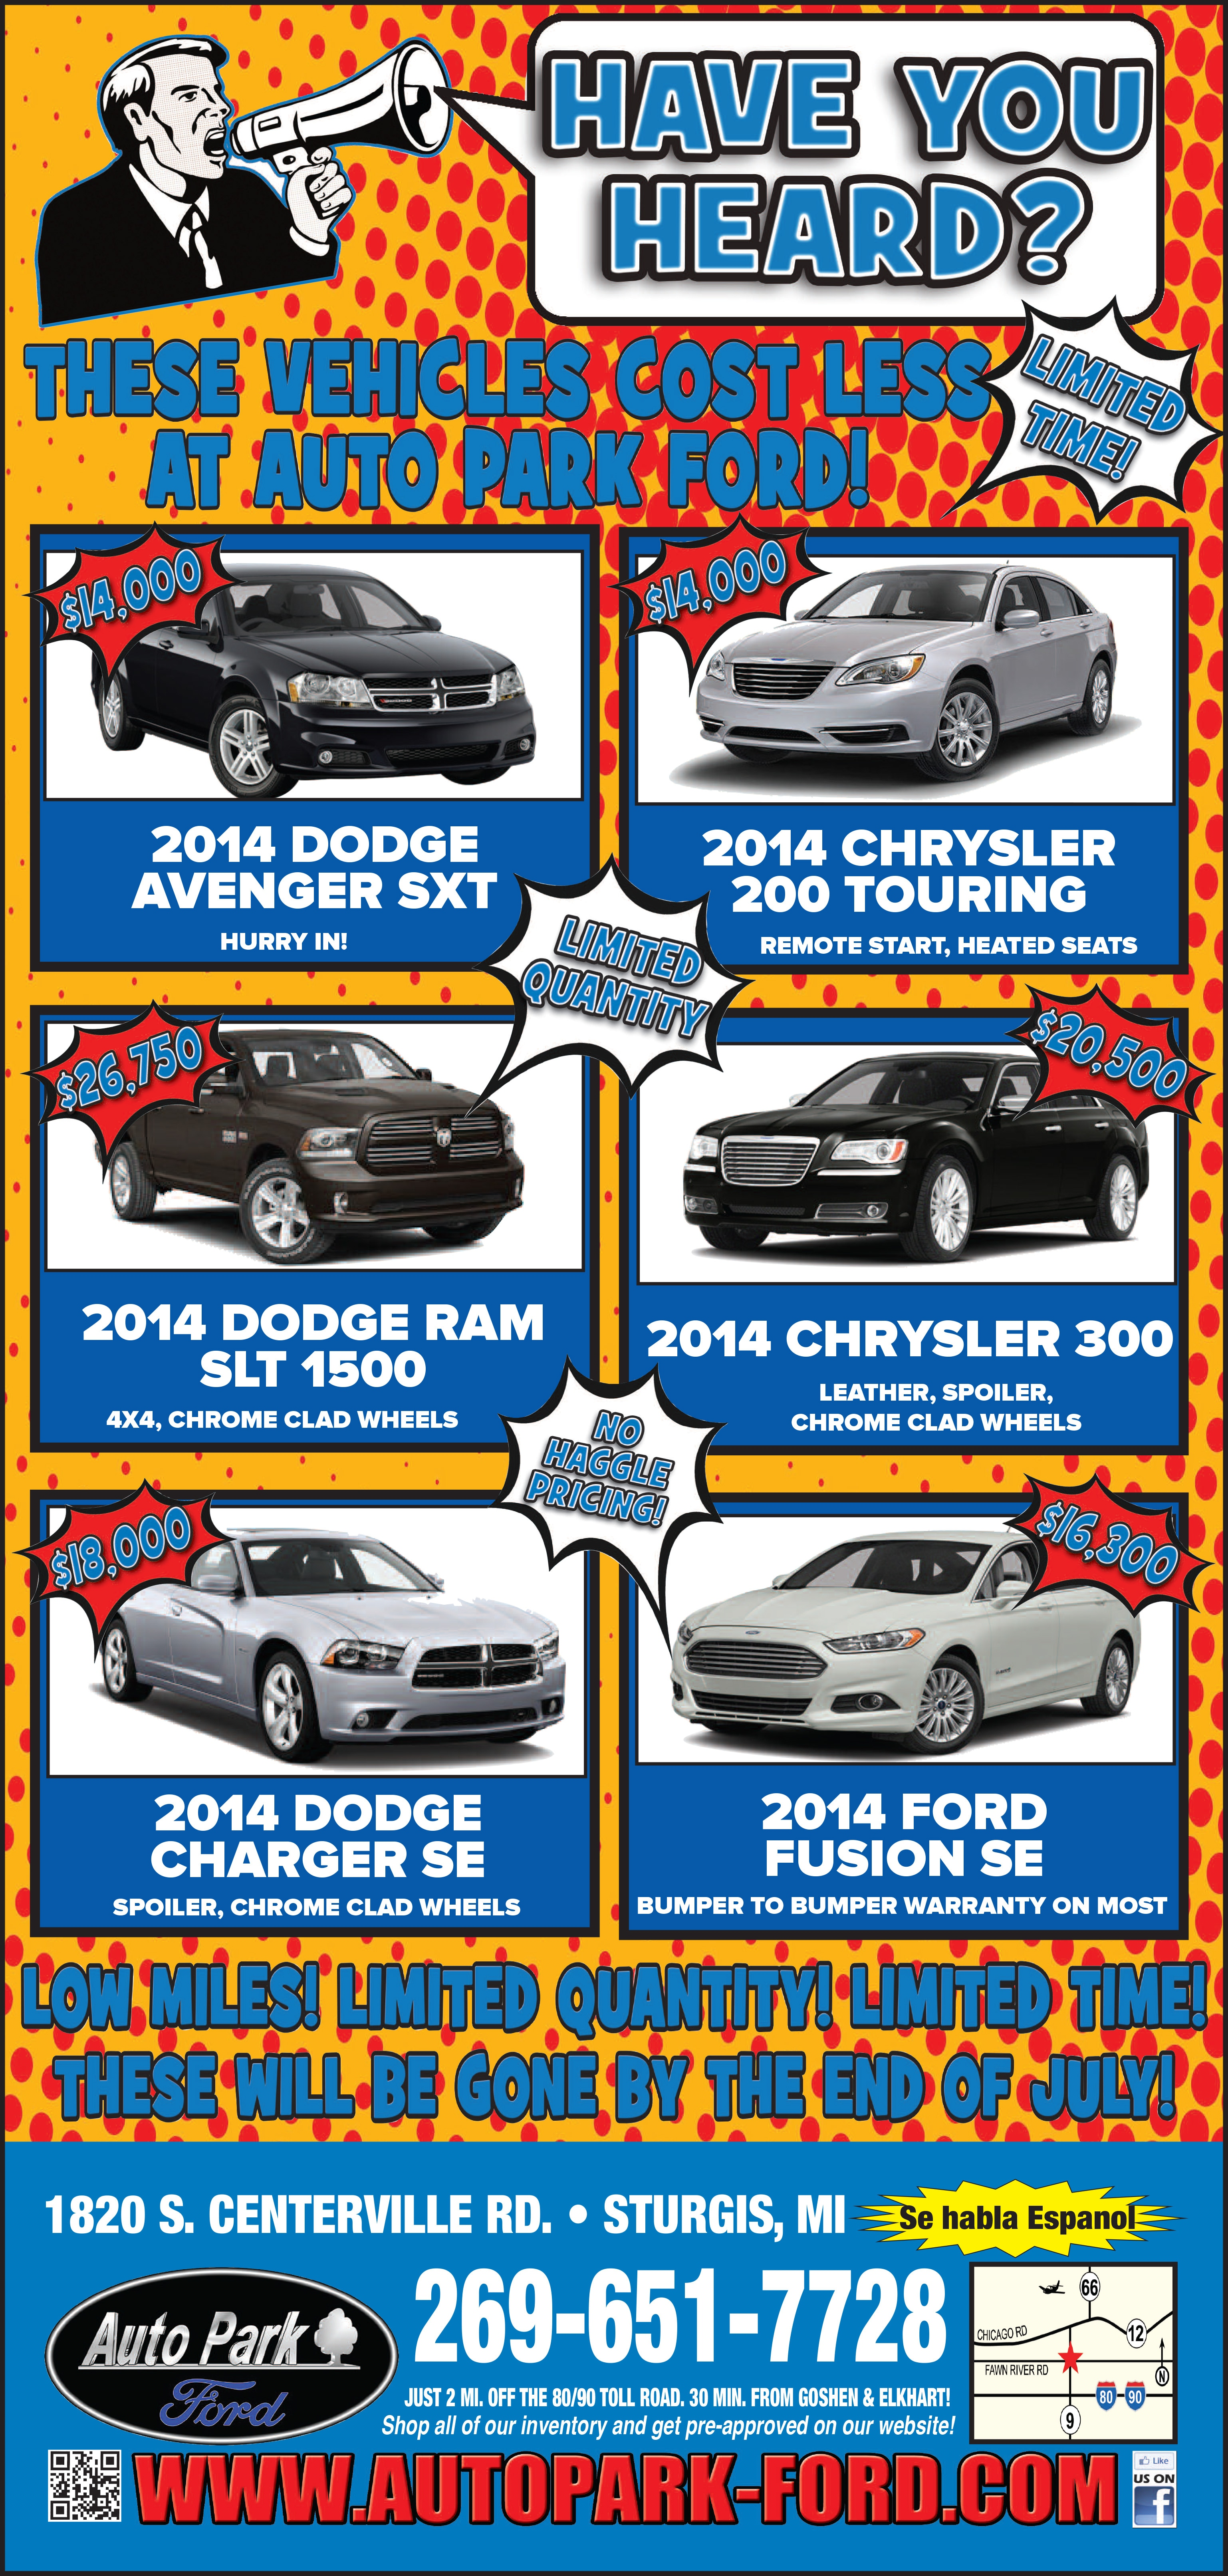 Auto Park Ford Sturgis Mi >> Auto Park Ford   New Ford dealership in Sturgis, MI 49091